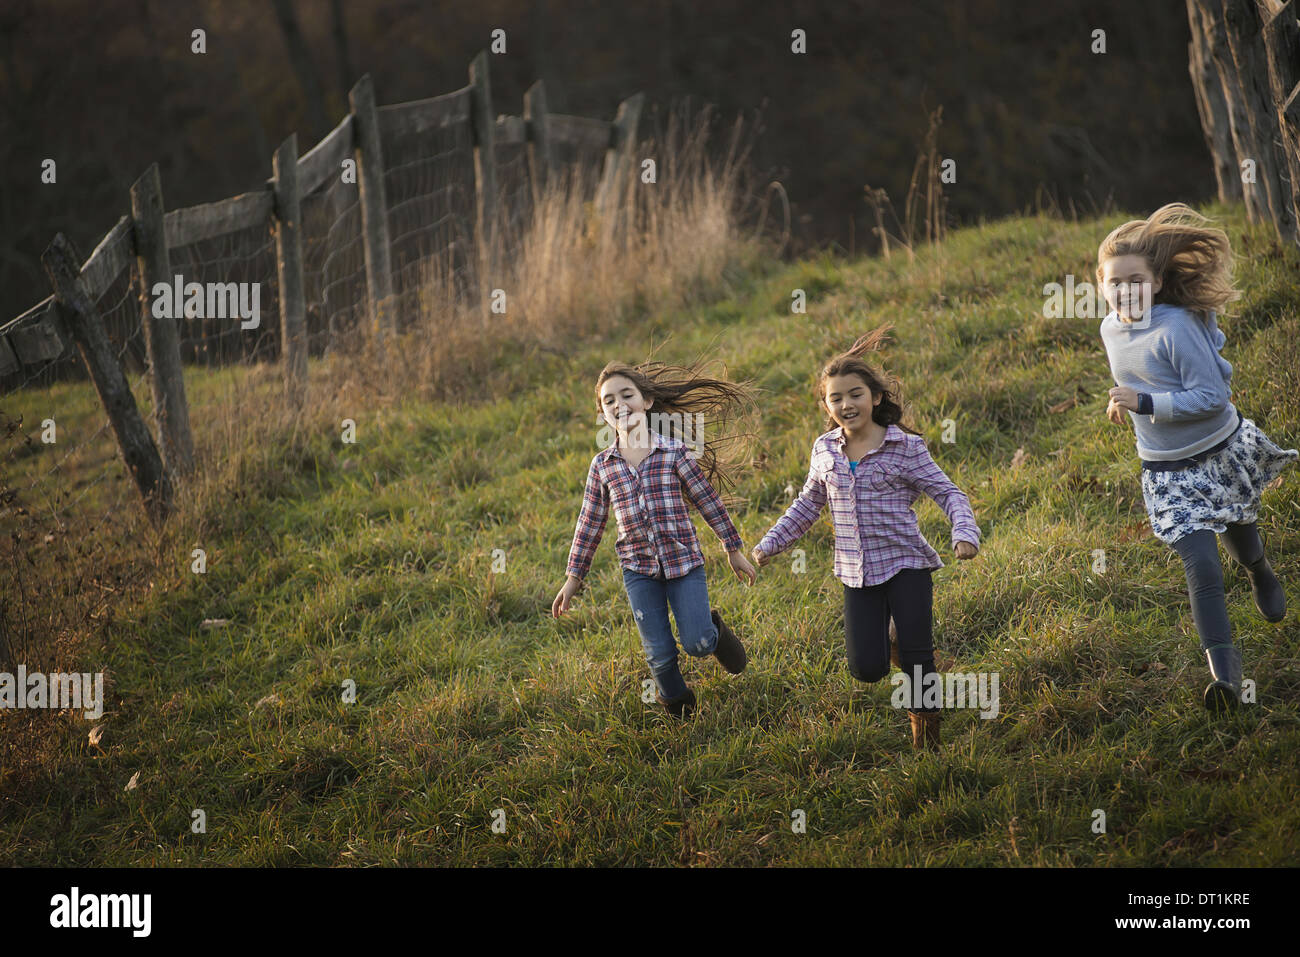 Three children running down a hill on an organic farm - Stock Image